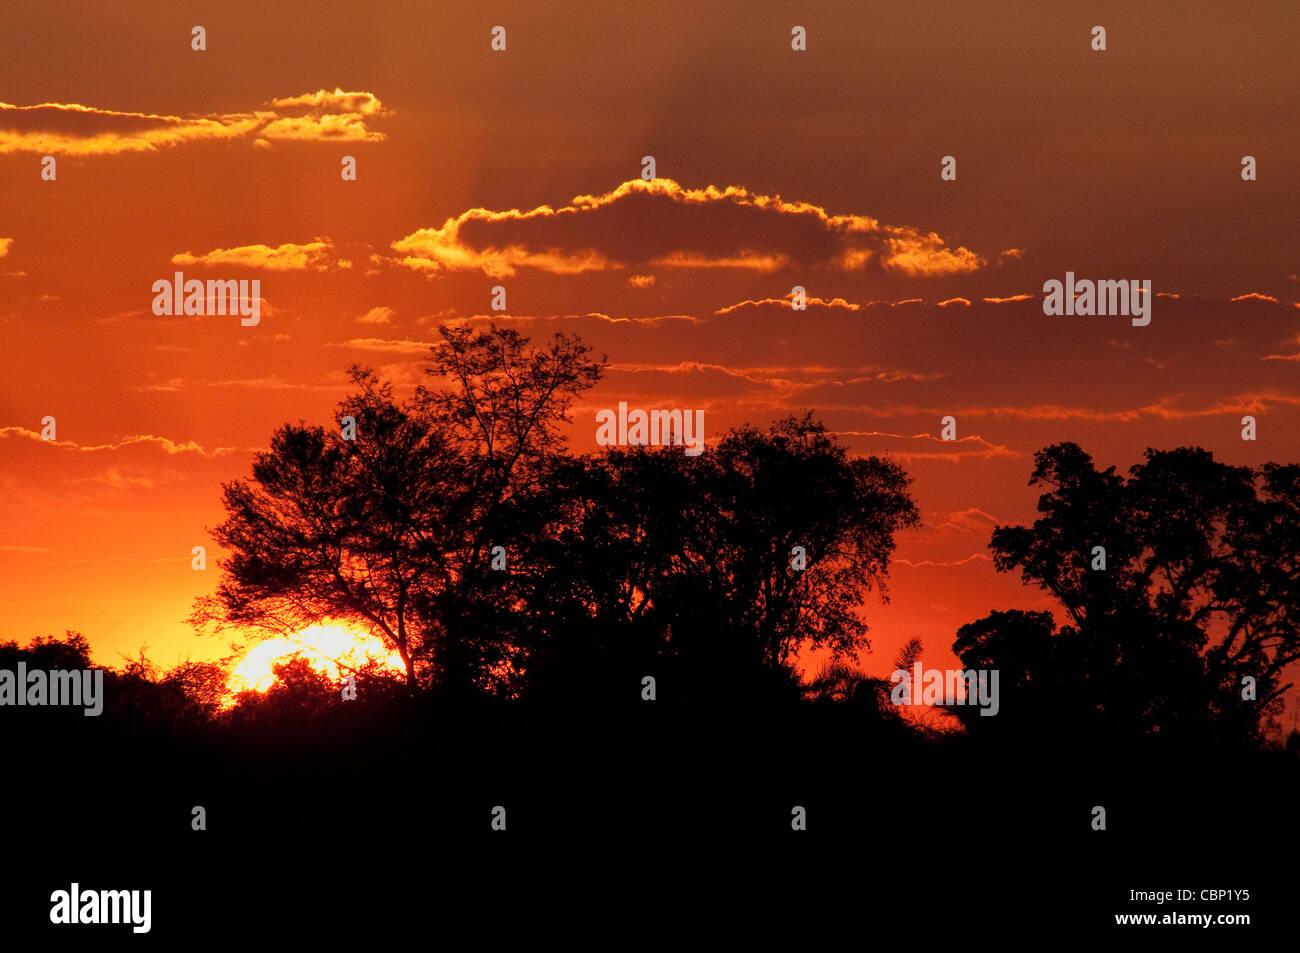 Sunset behind trees at Okavango Delta - Stock Image